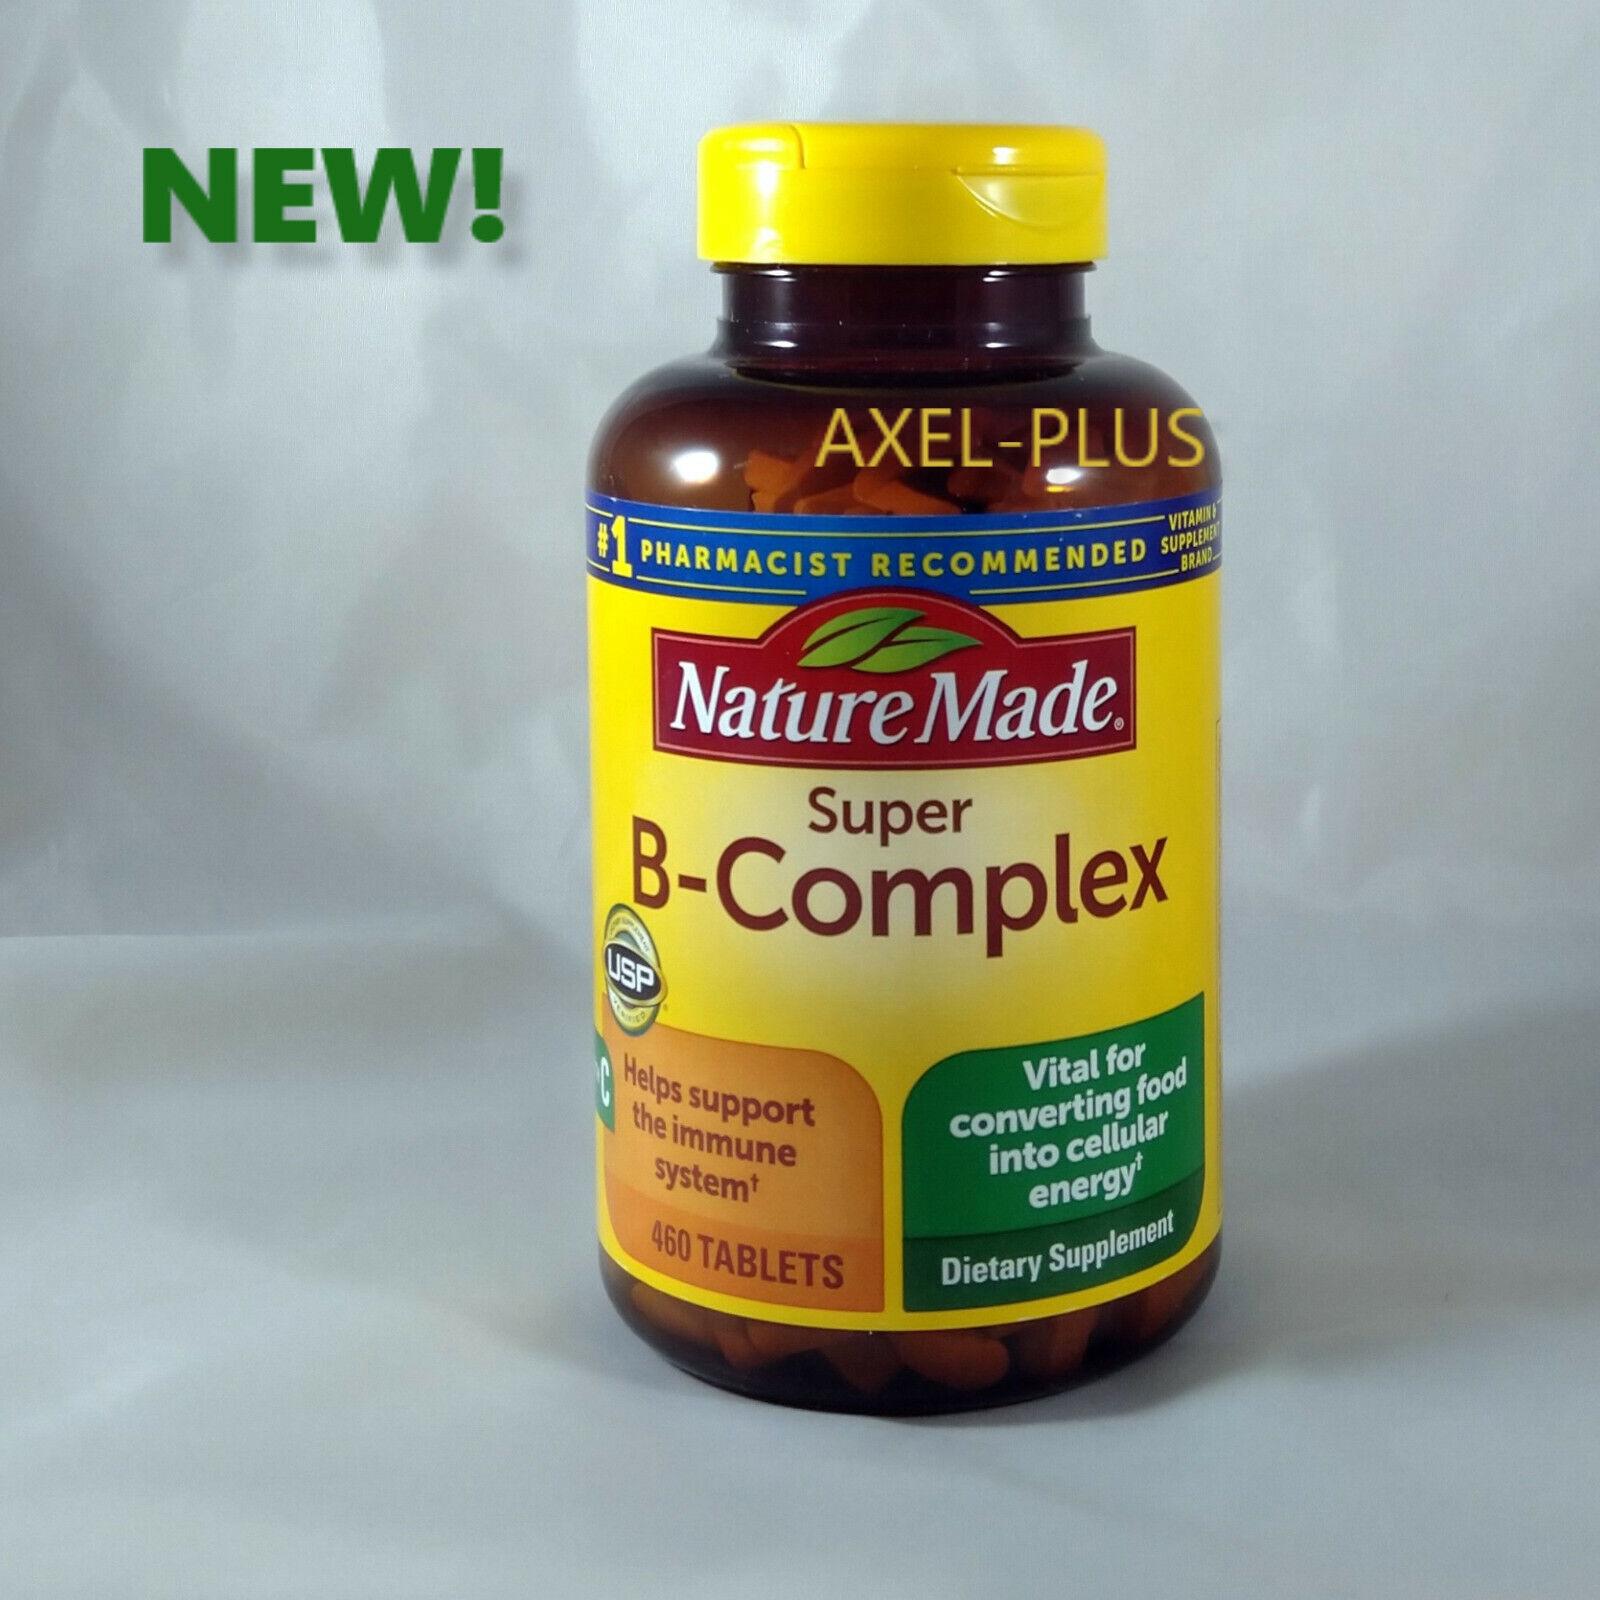 Nature Made Super B-Complex with Vitamin C & Folic Acid, 460